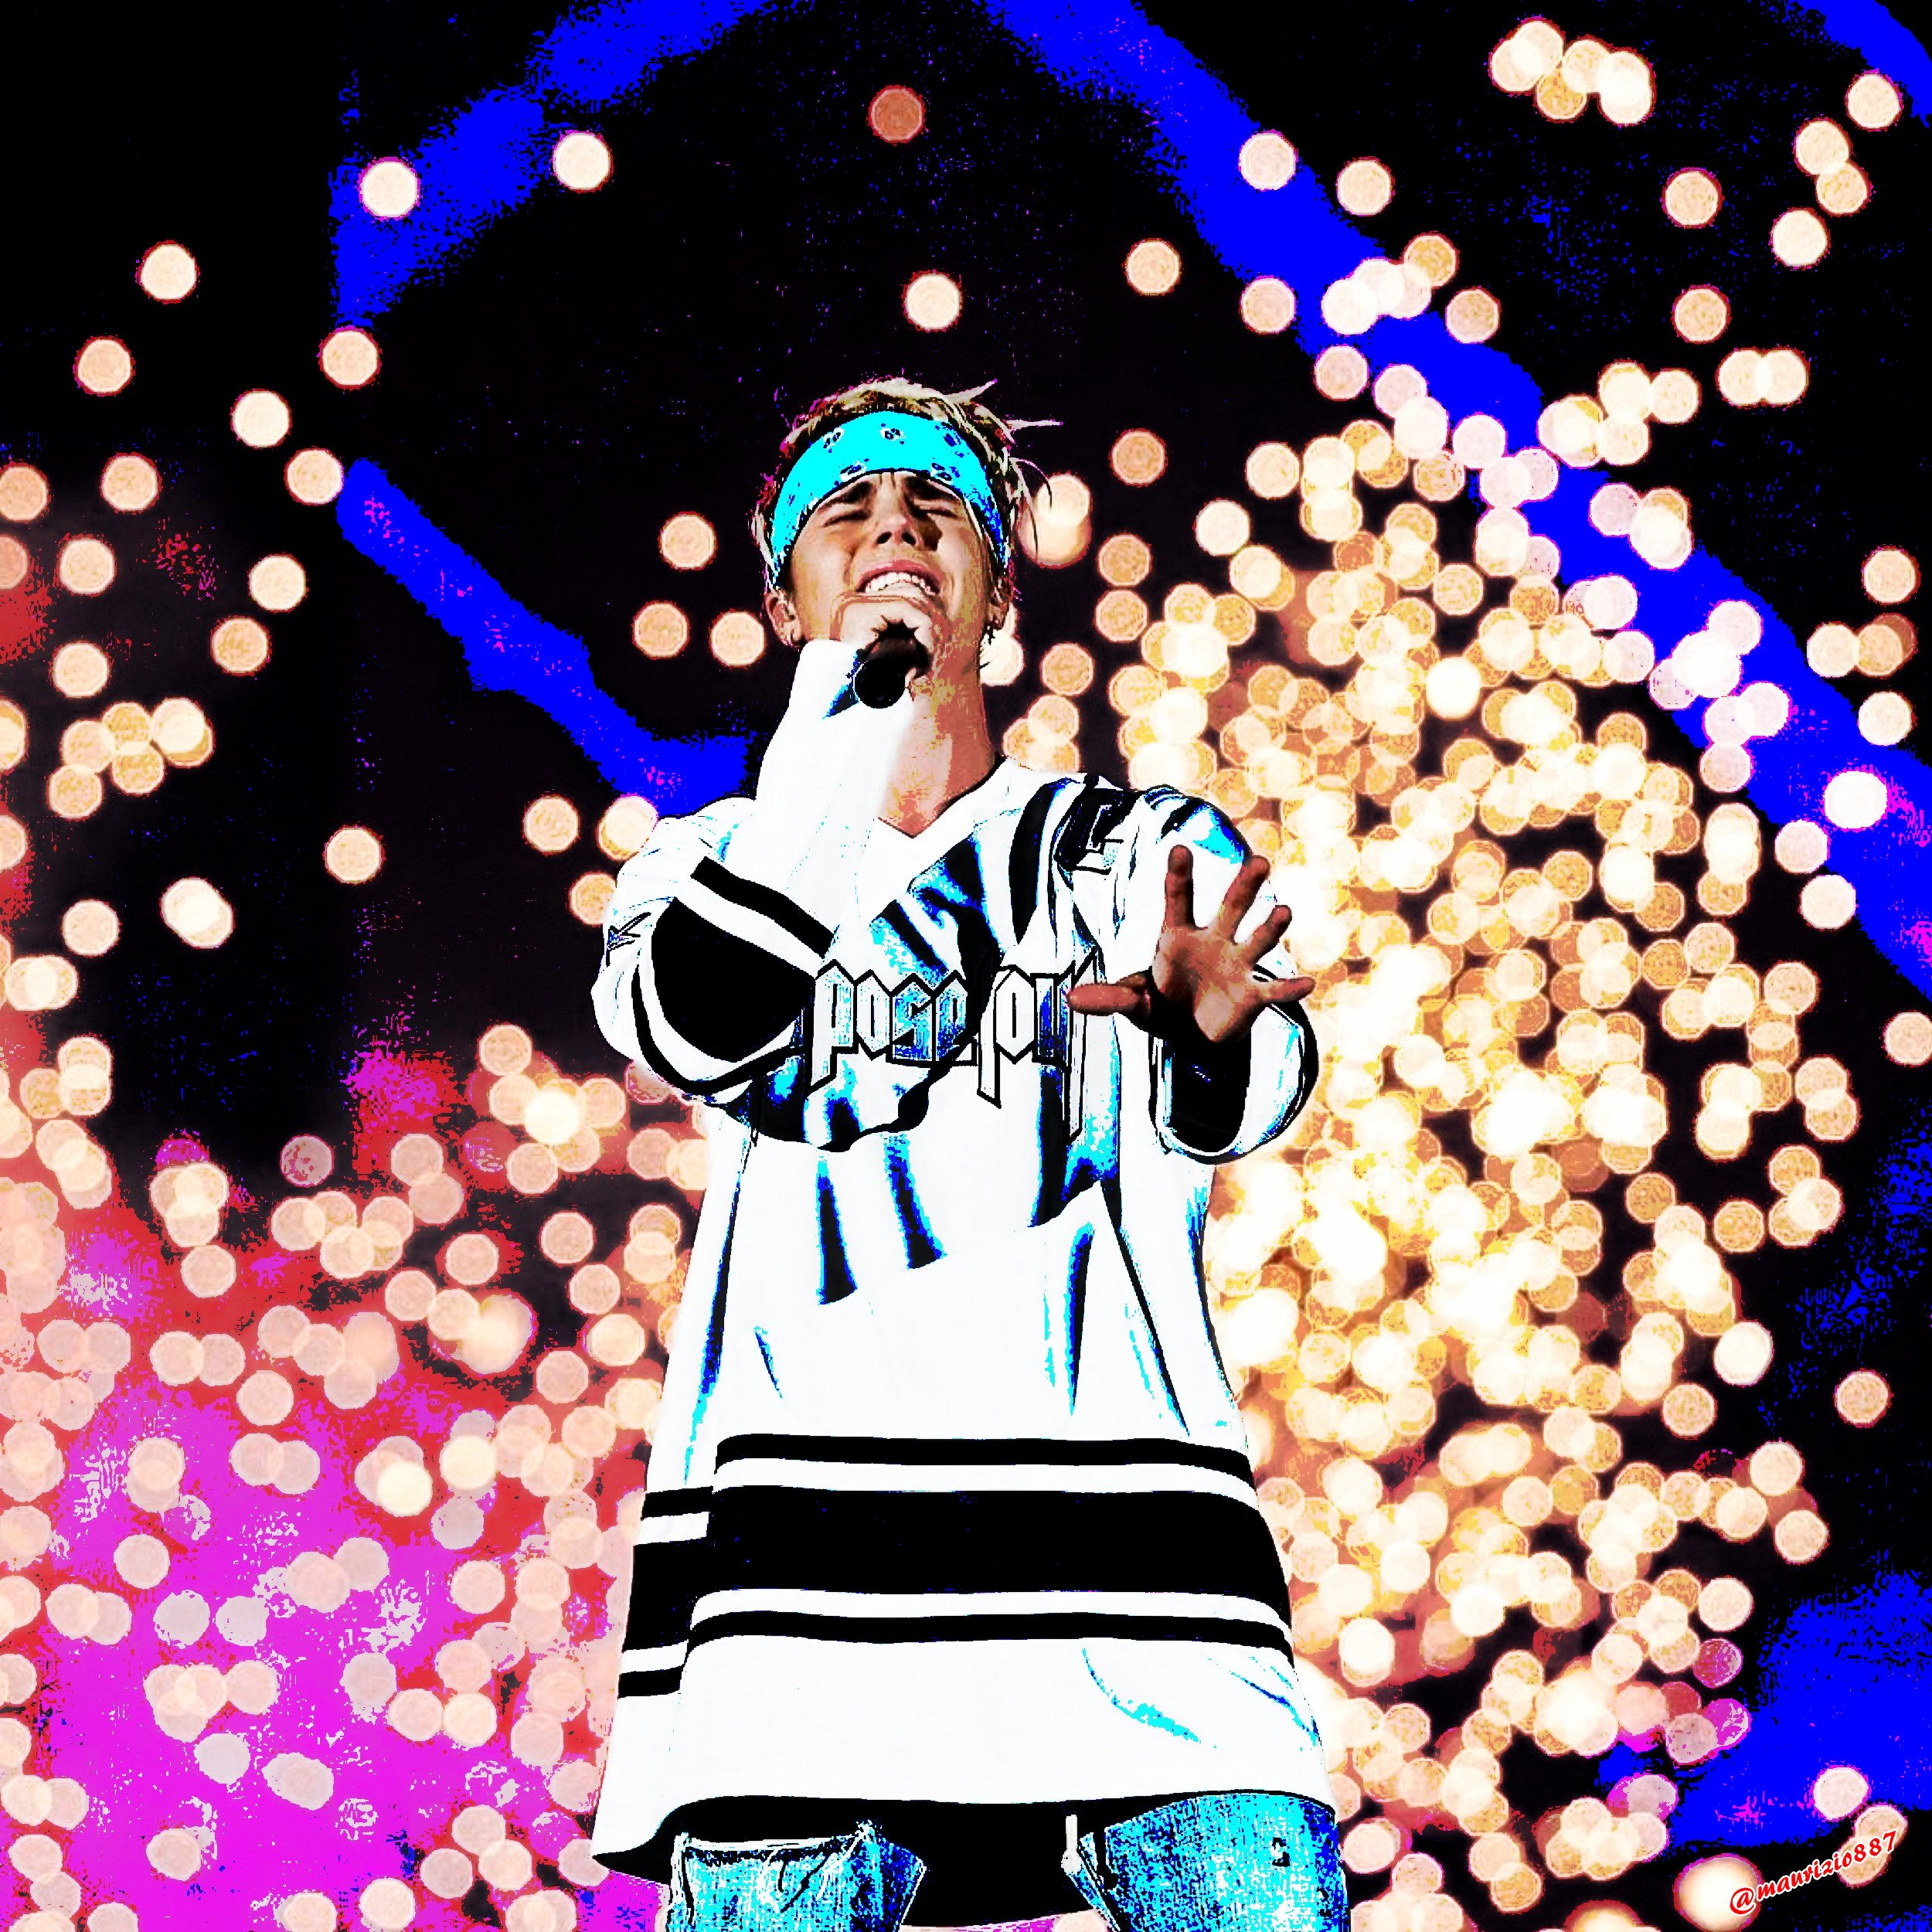 Justin Bieber images justin bieberPurpose World Tour2016 HD 2500x2500